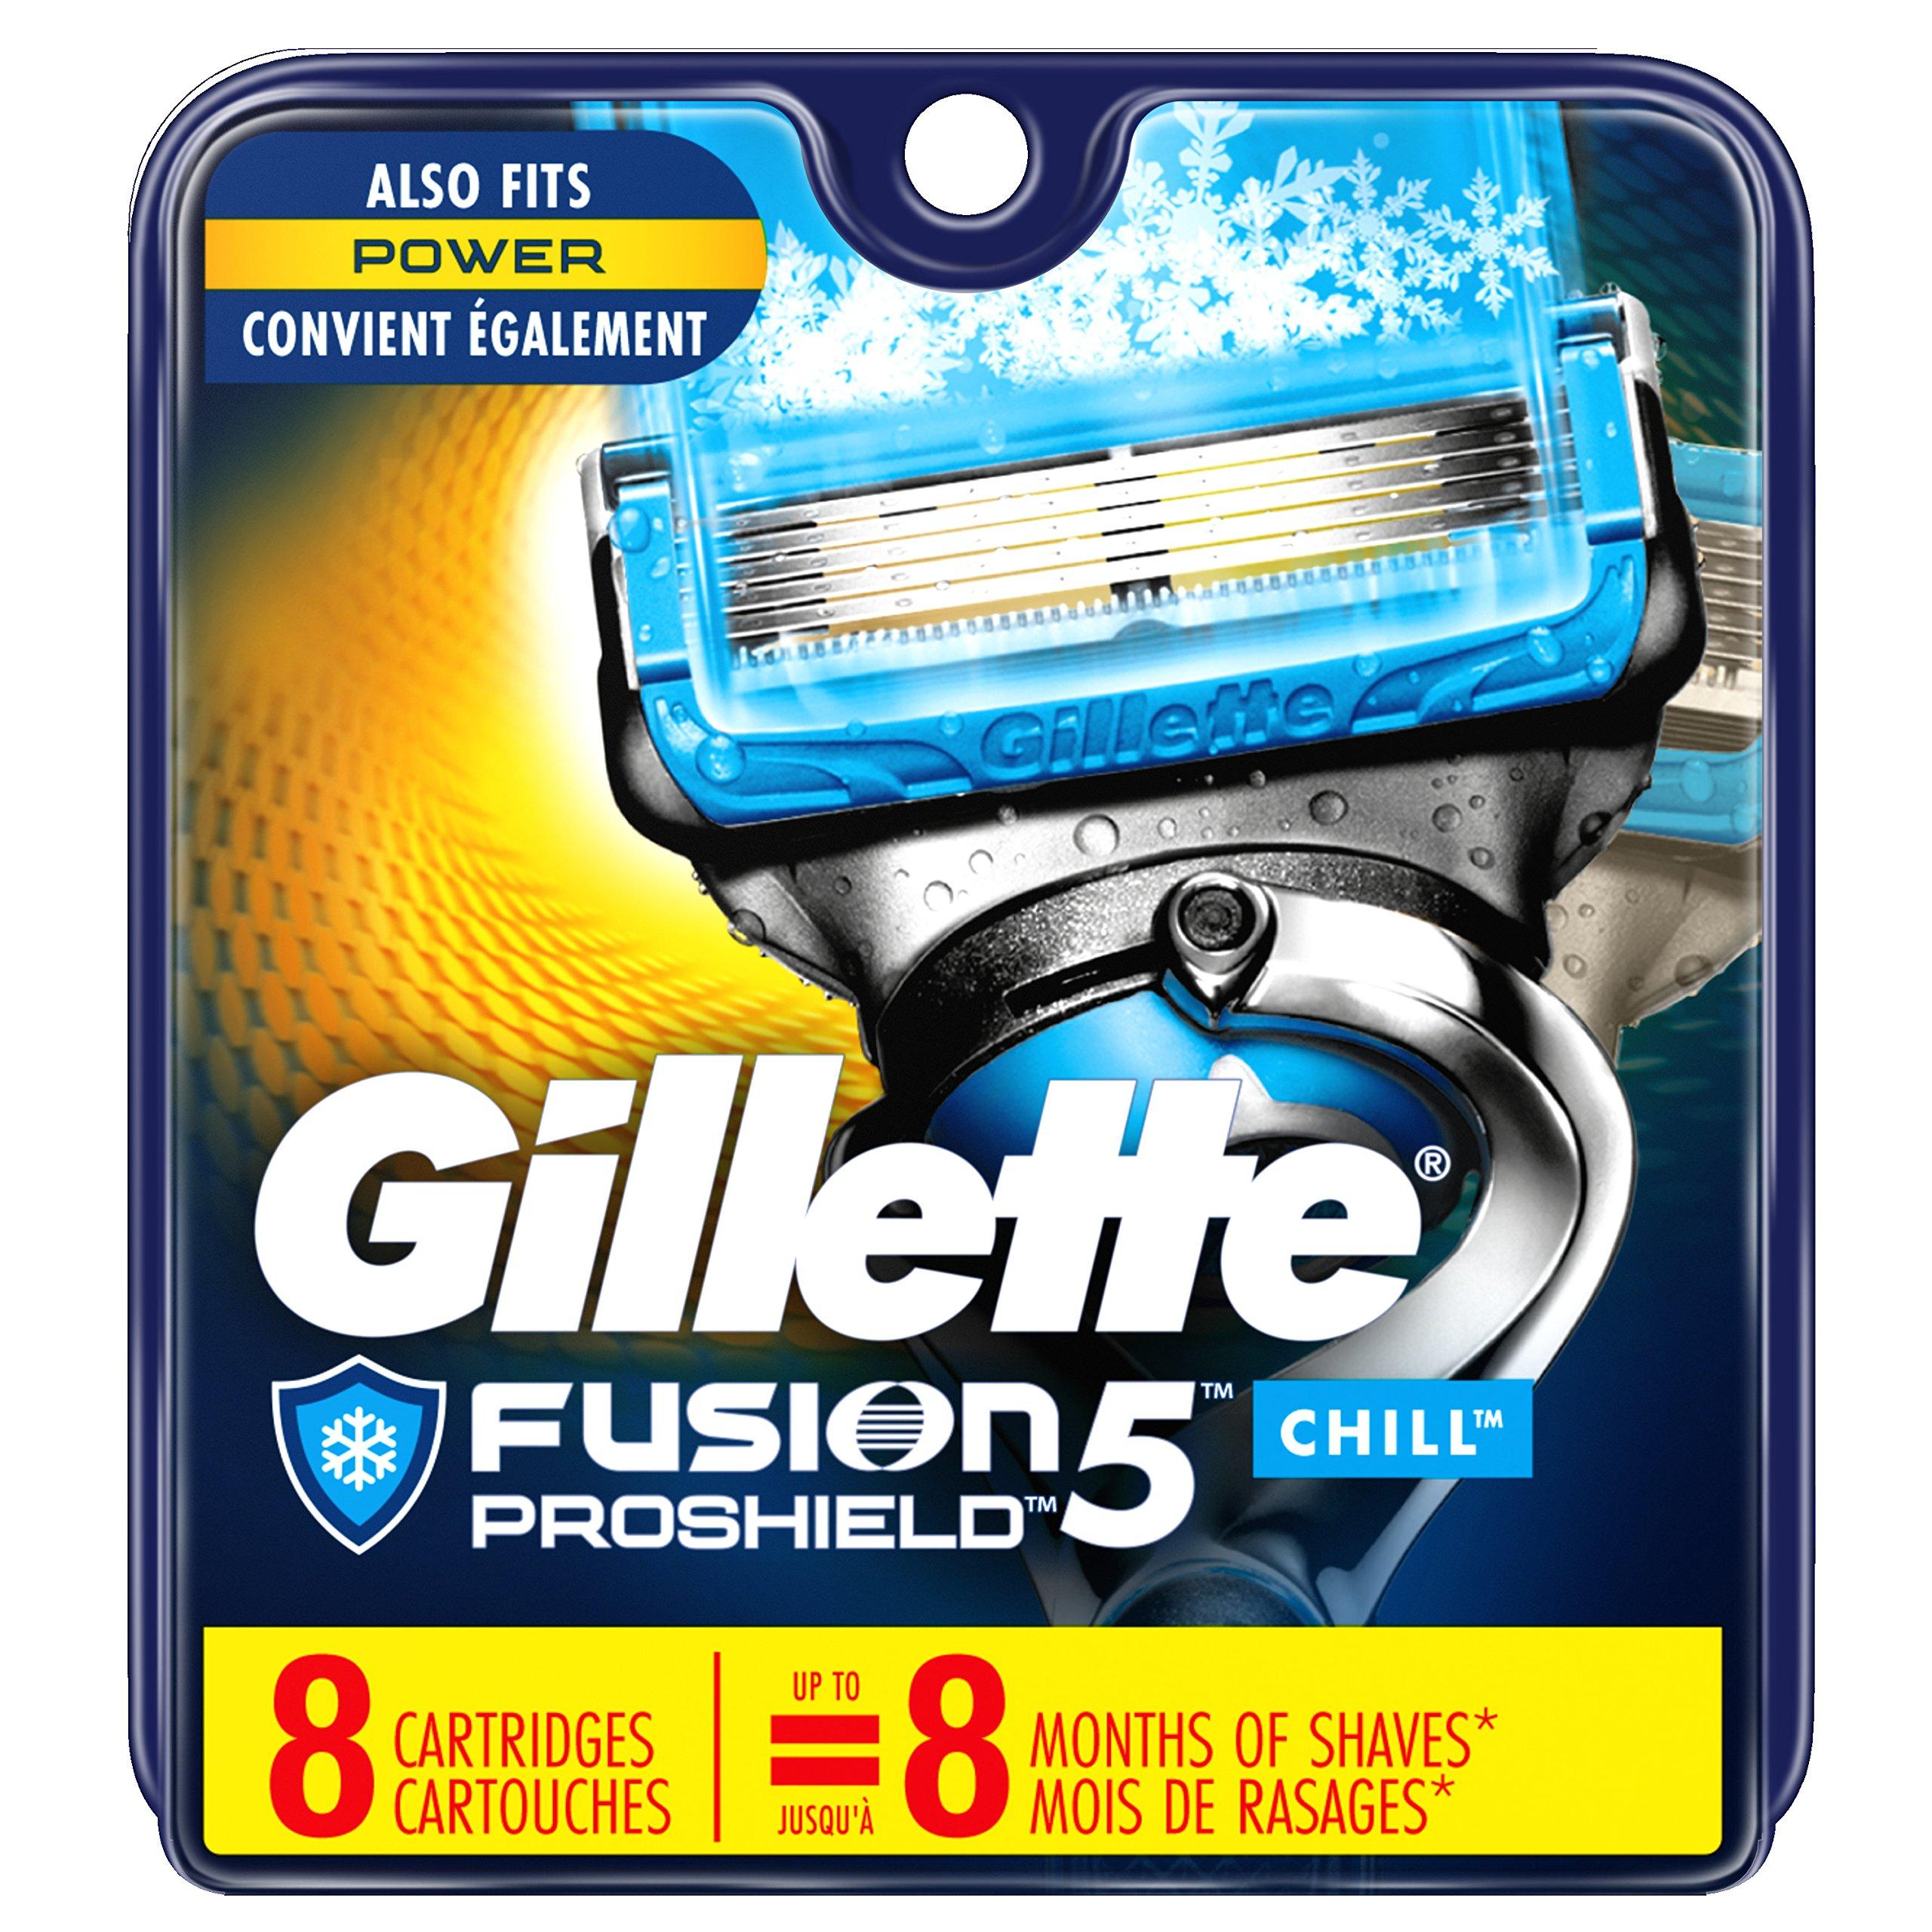 Gillette Fusion ProShield Chill Men's Razor Blade Refills, 8 Count, Mens Razors/Blades by Gillette (Image #1)